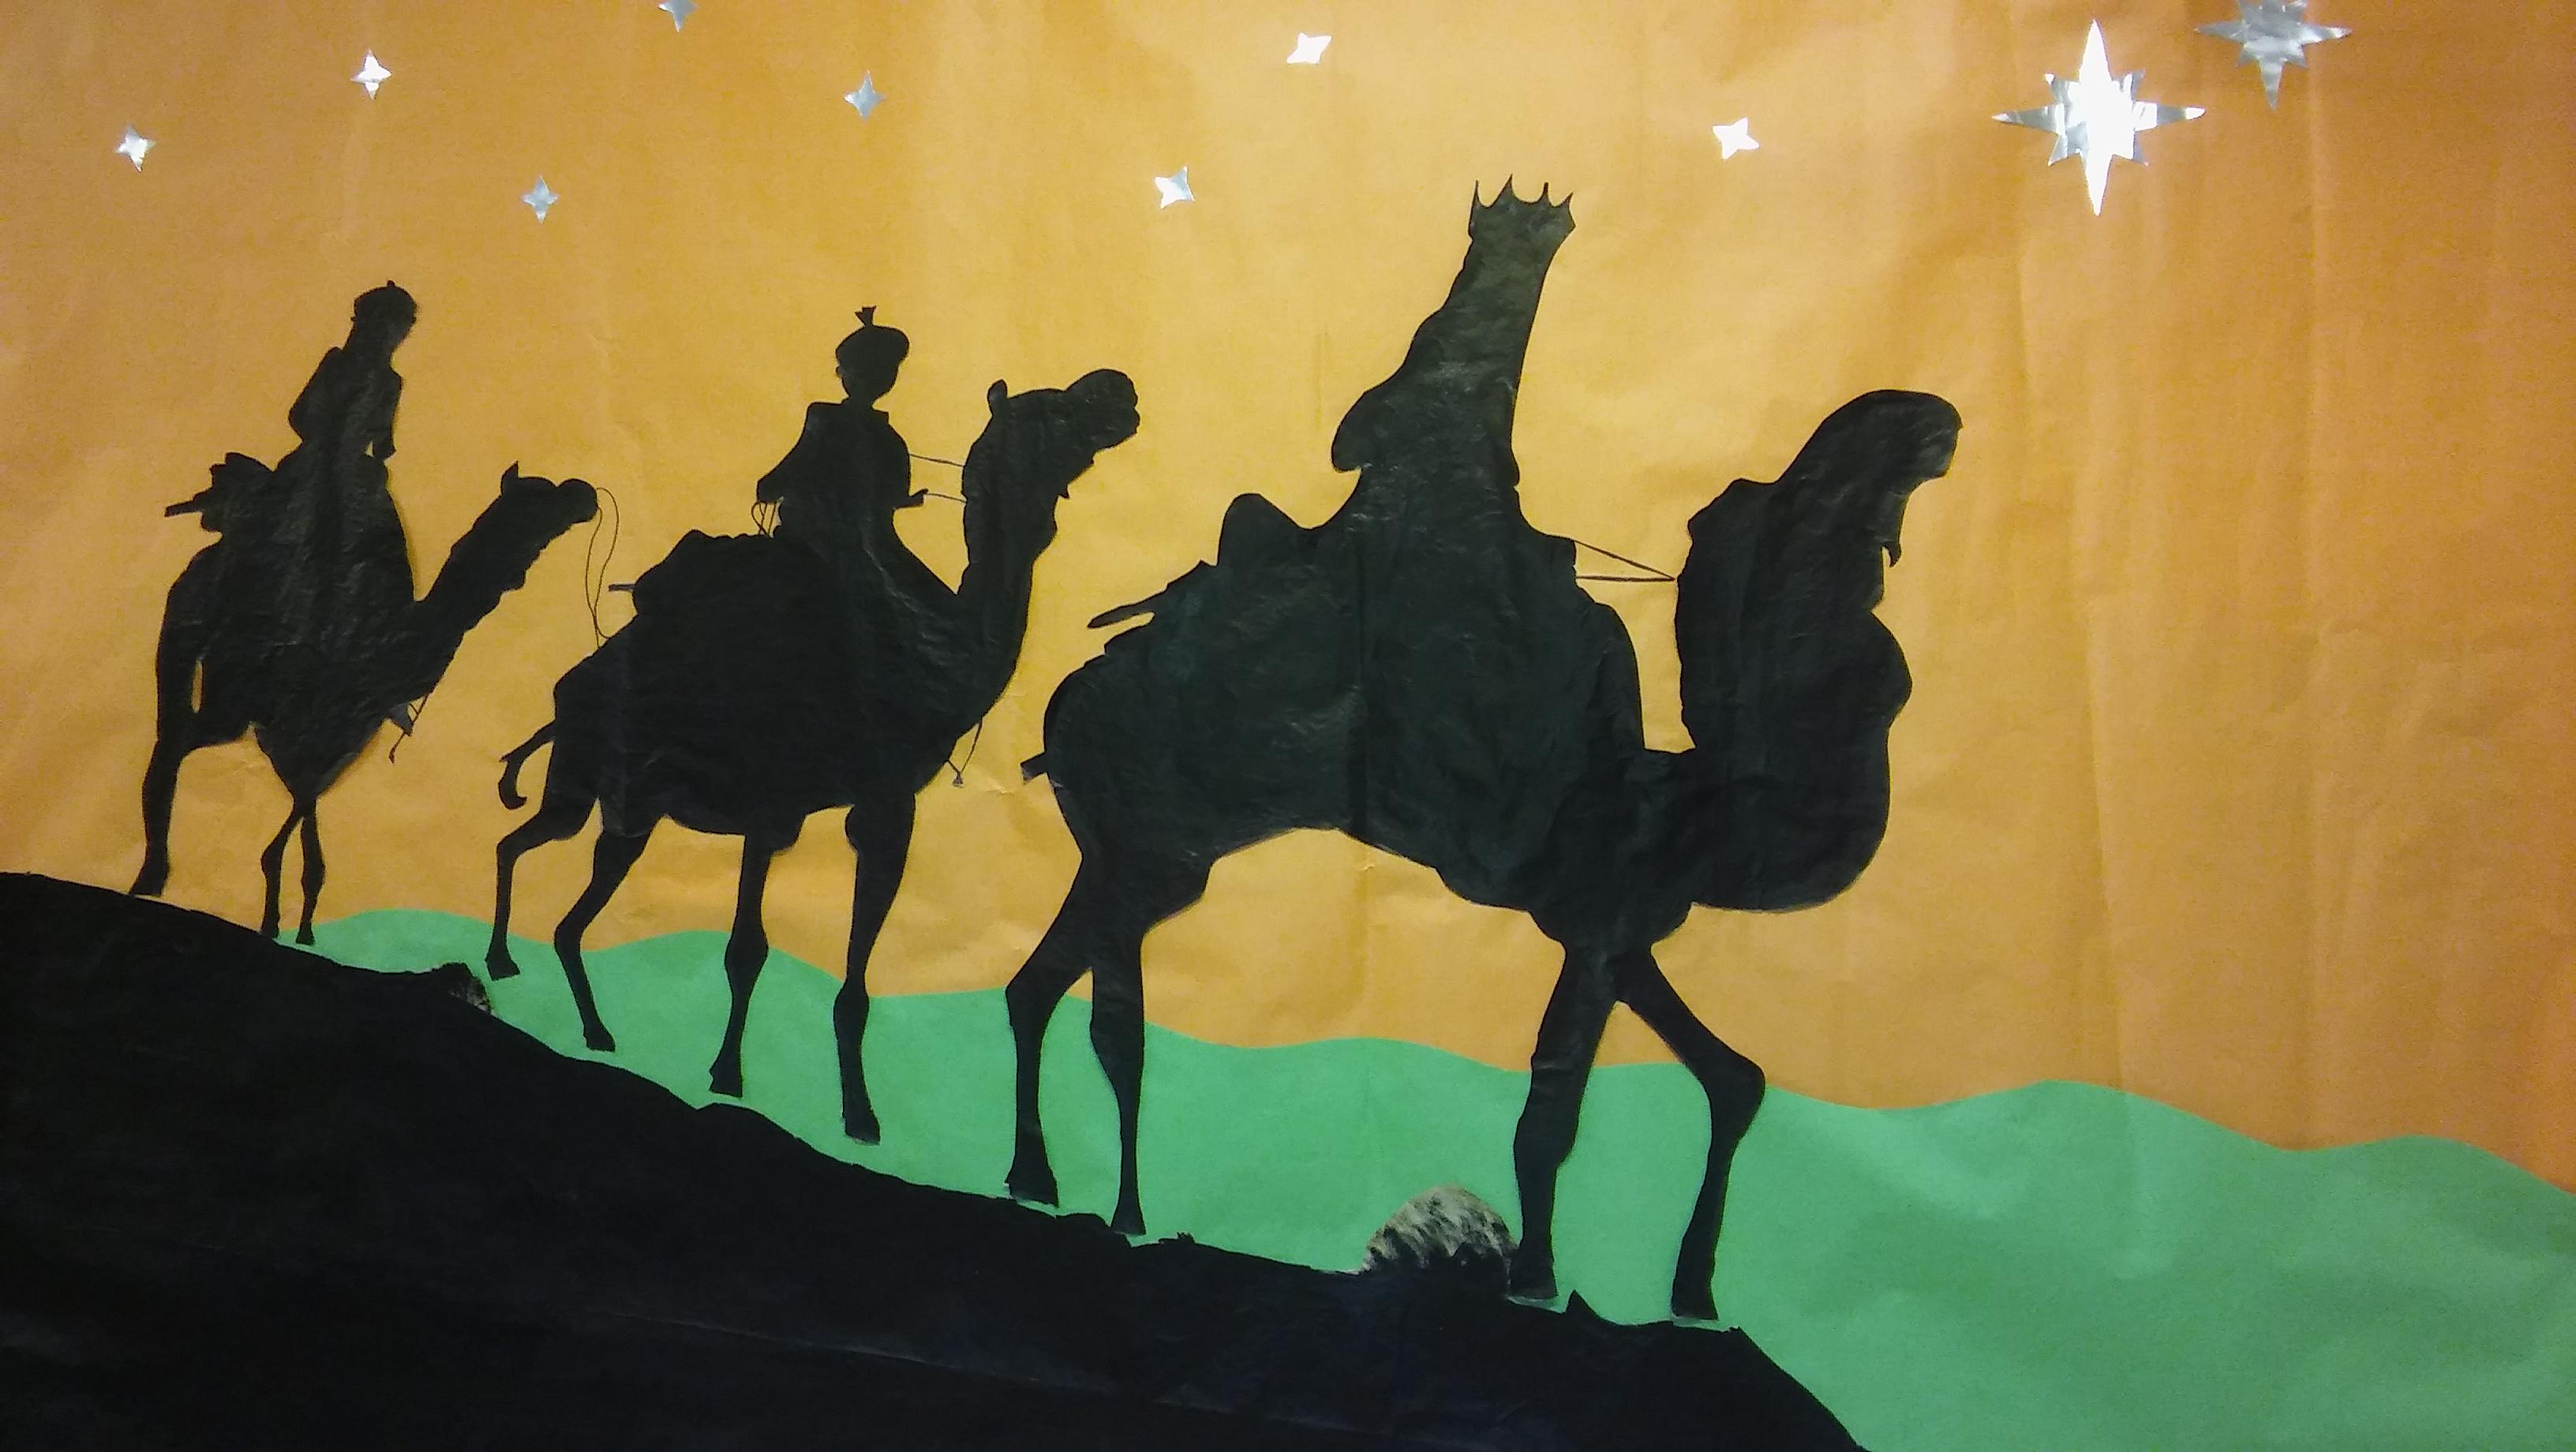 Celebramos los 'Reyes Majos'